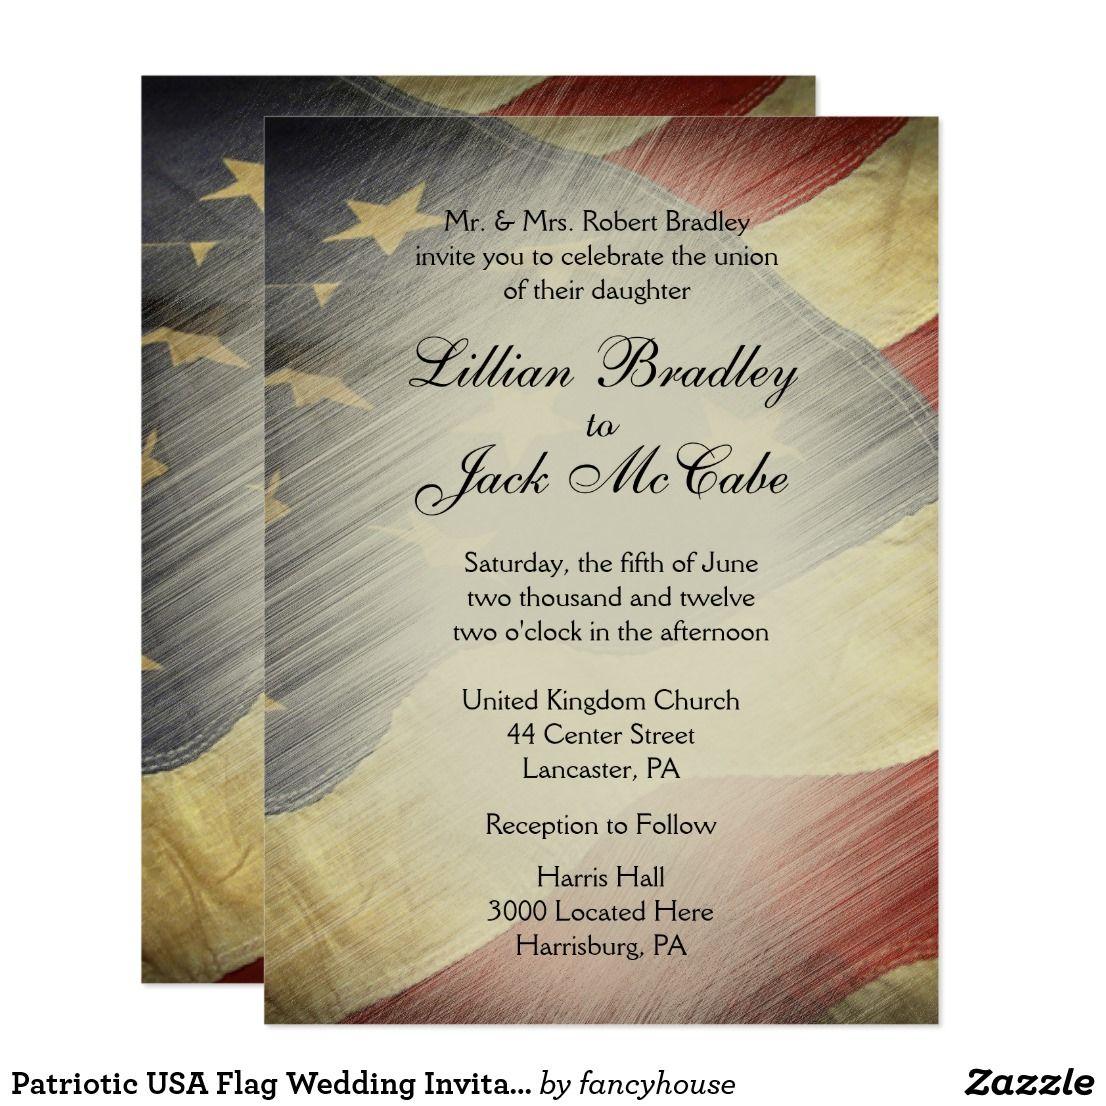 Patriotic USA Flag Wedding Invitations | Usa flag and Weddings